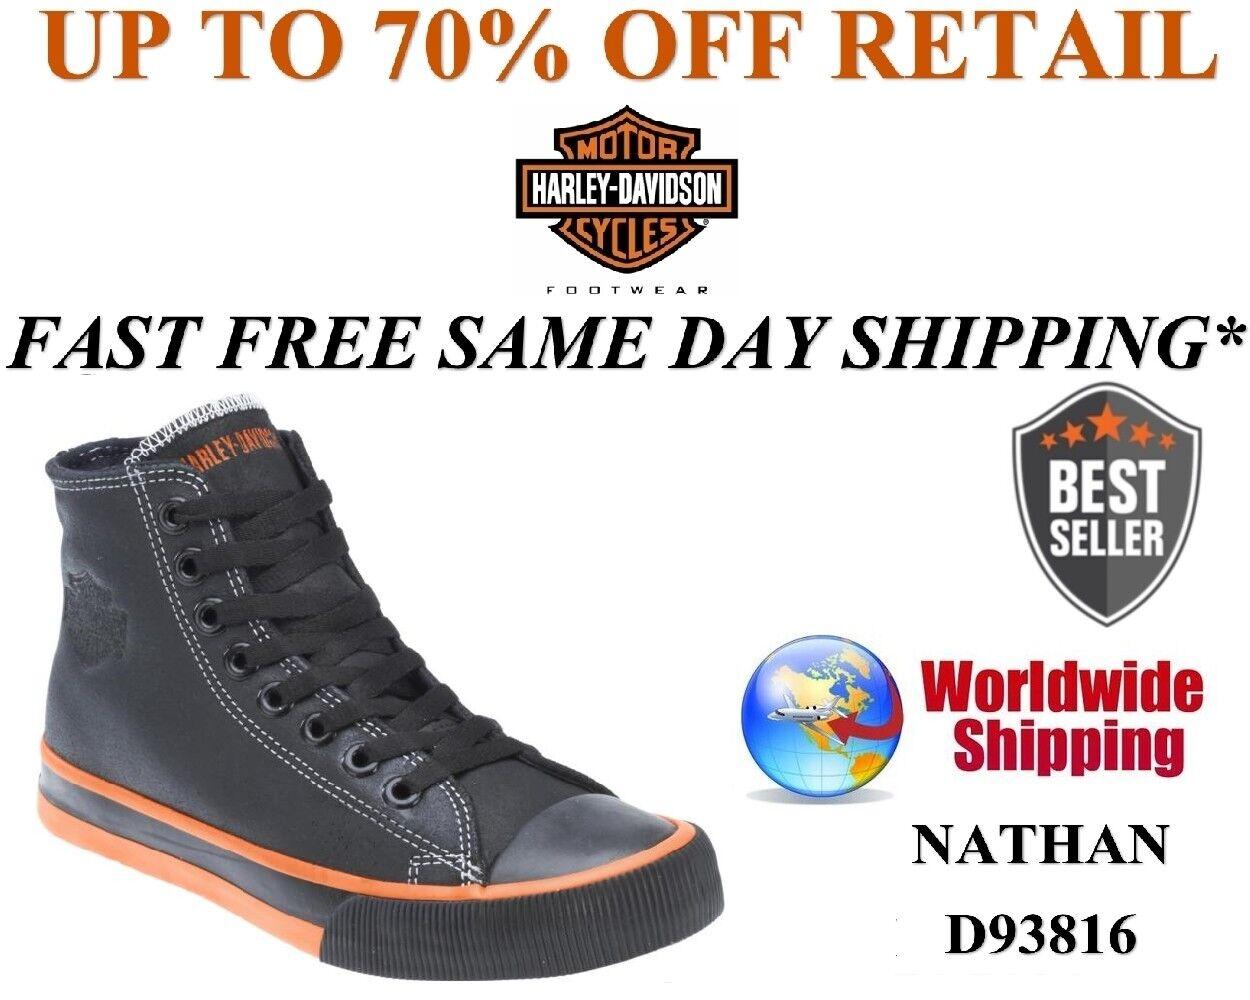 Harley-Davidson D93816 Mens Nathan Black Hi-Top Sneakers shoes